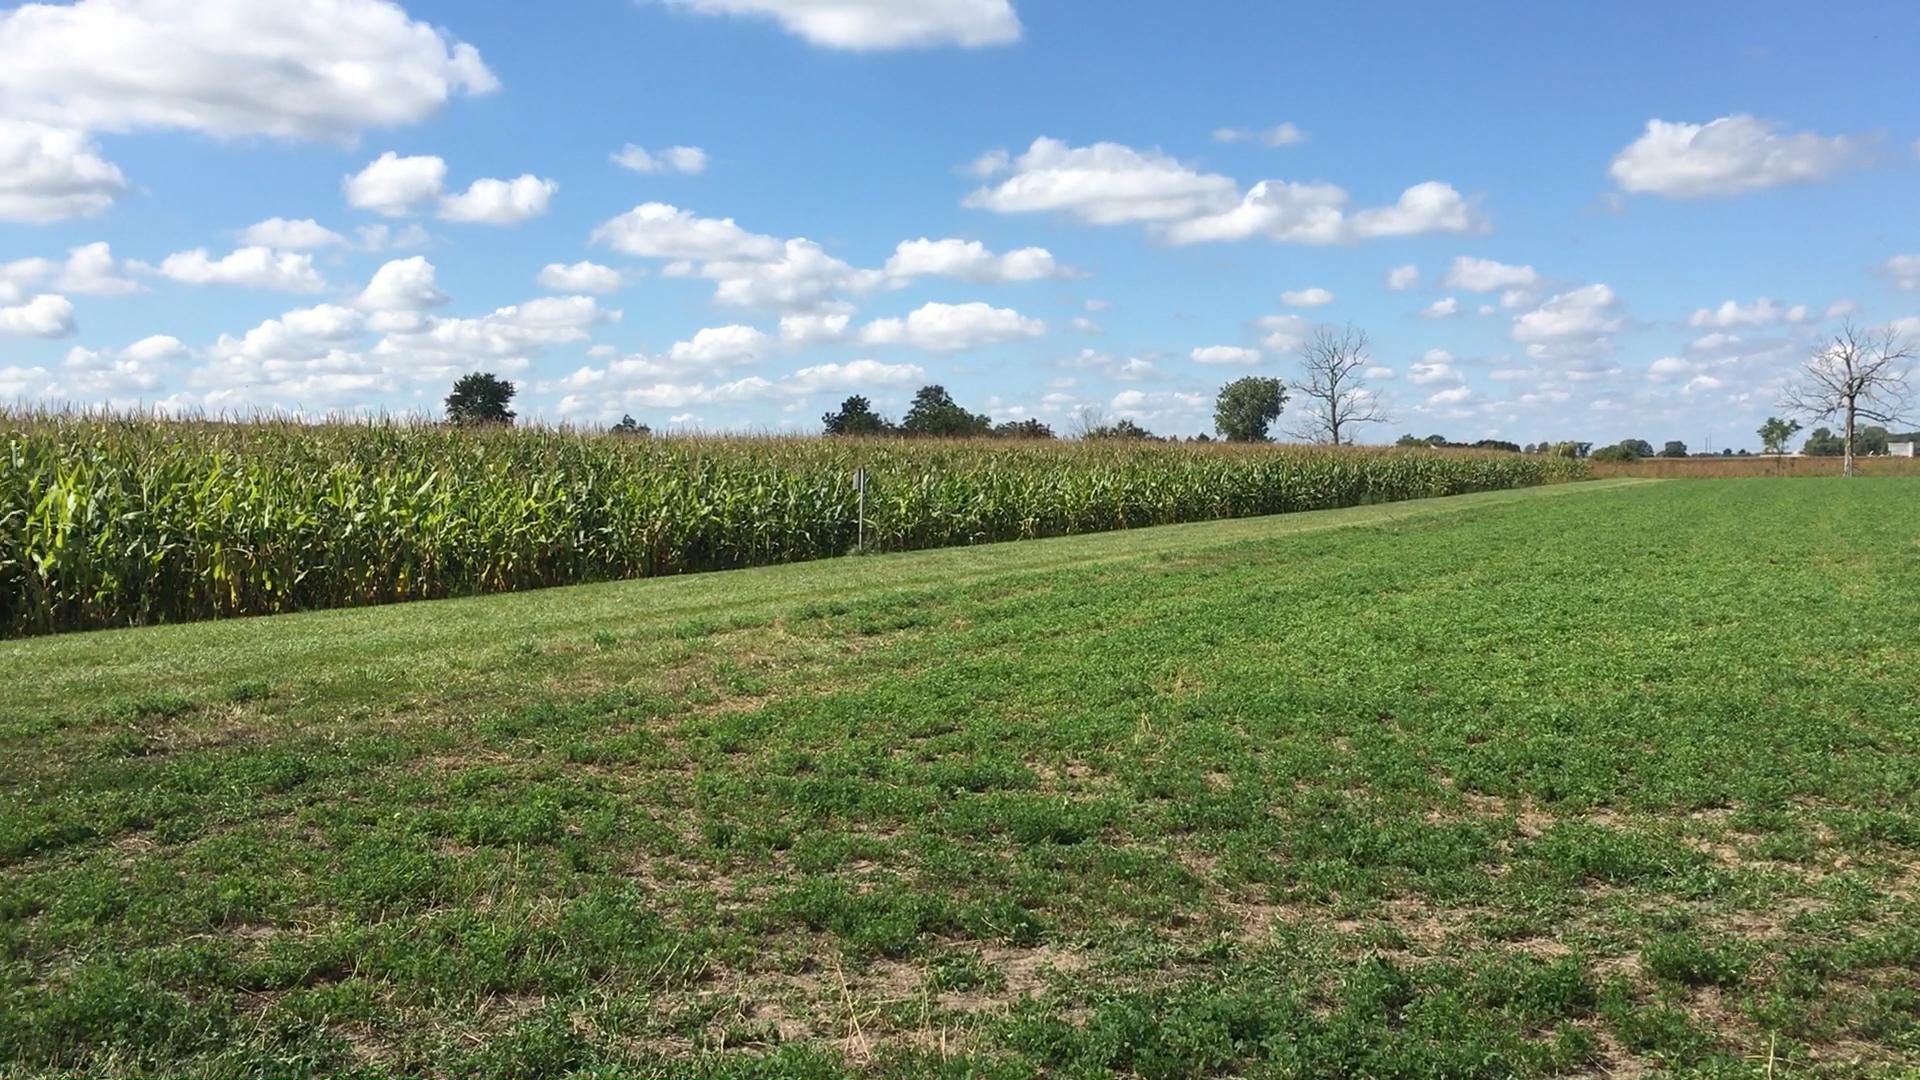 Caption: A northwest Ohio farm, Credit: Elizabeth Miller/ideastream